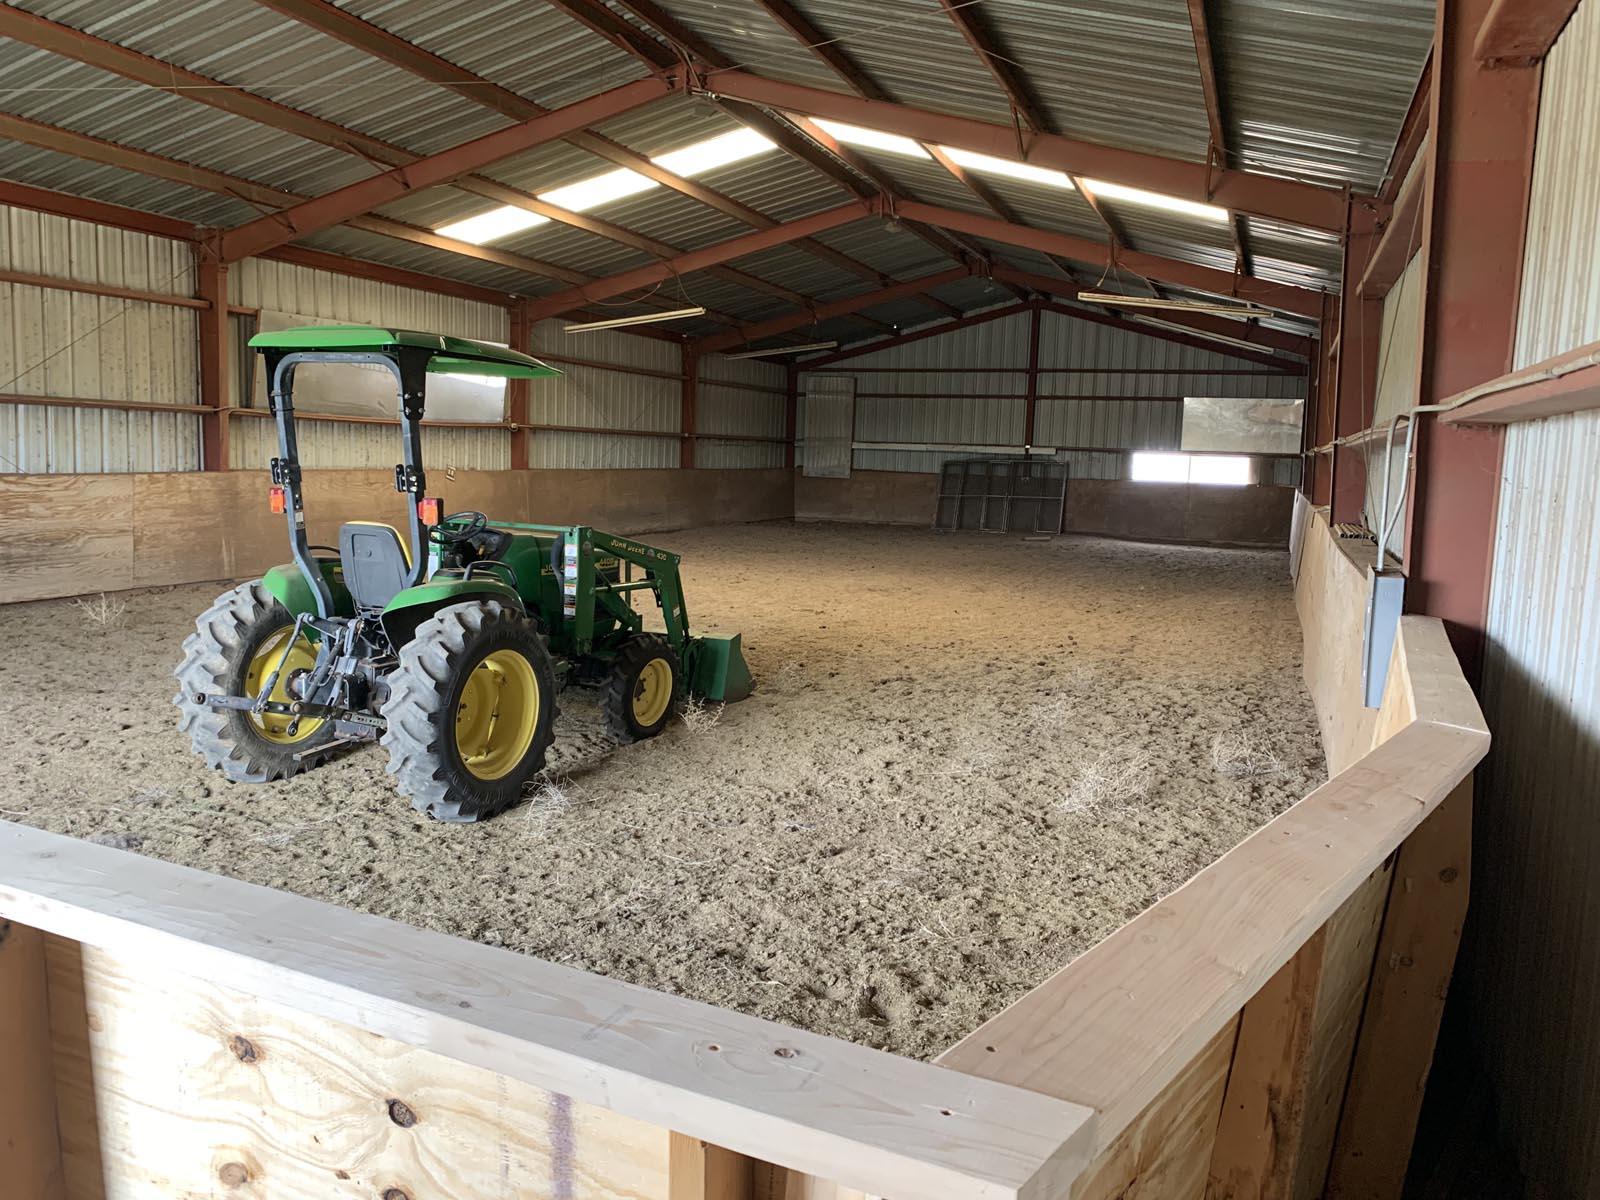 Indoors at Tiger Owl Ranch horse boarding facility in Santa Fe, New Mexico